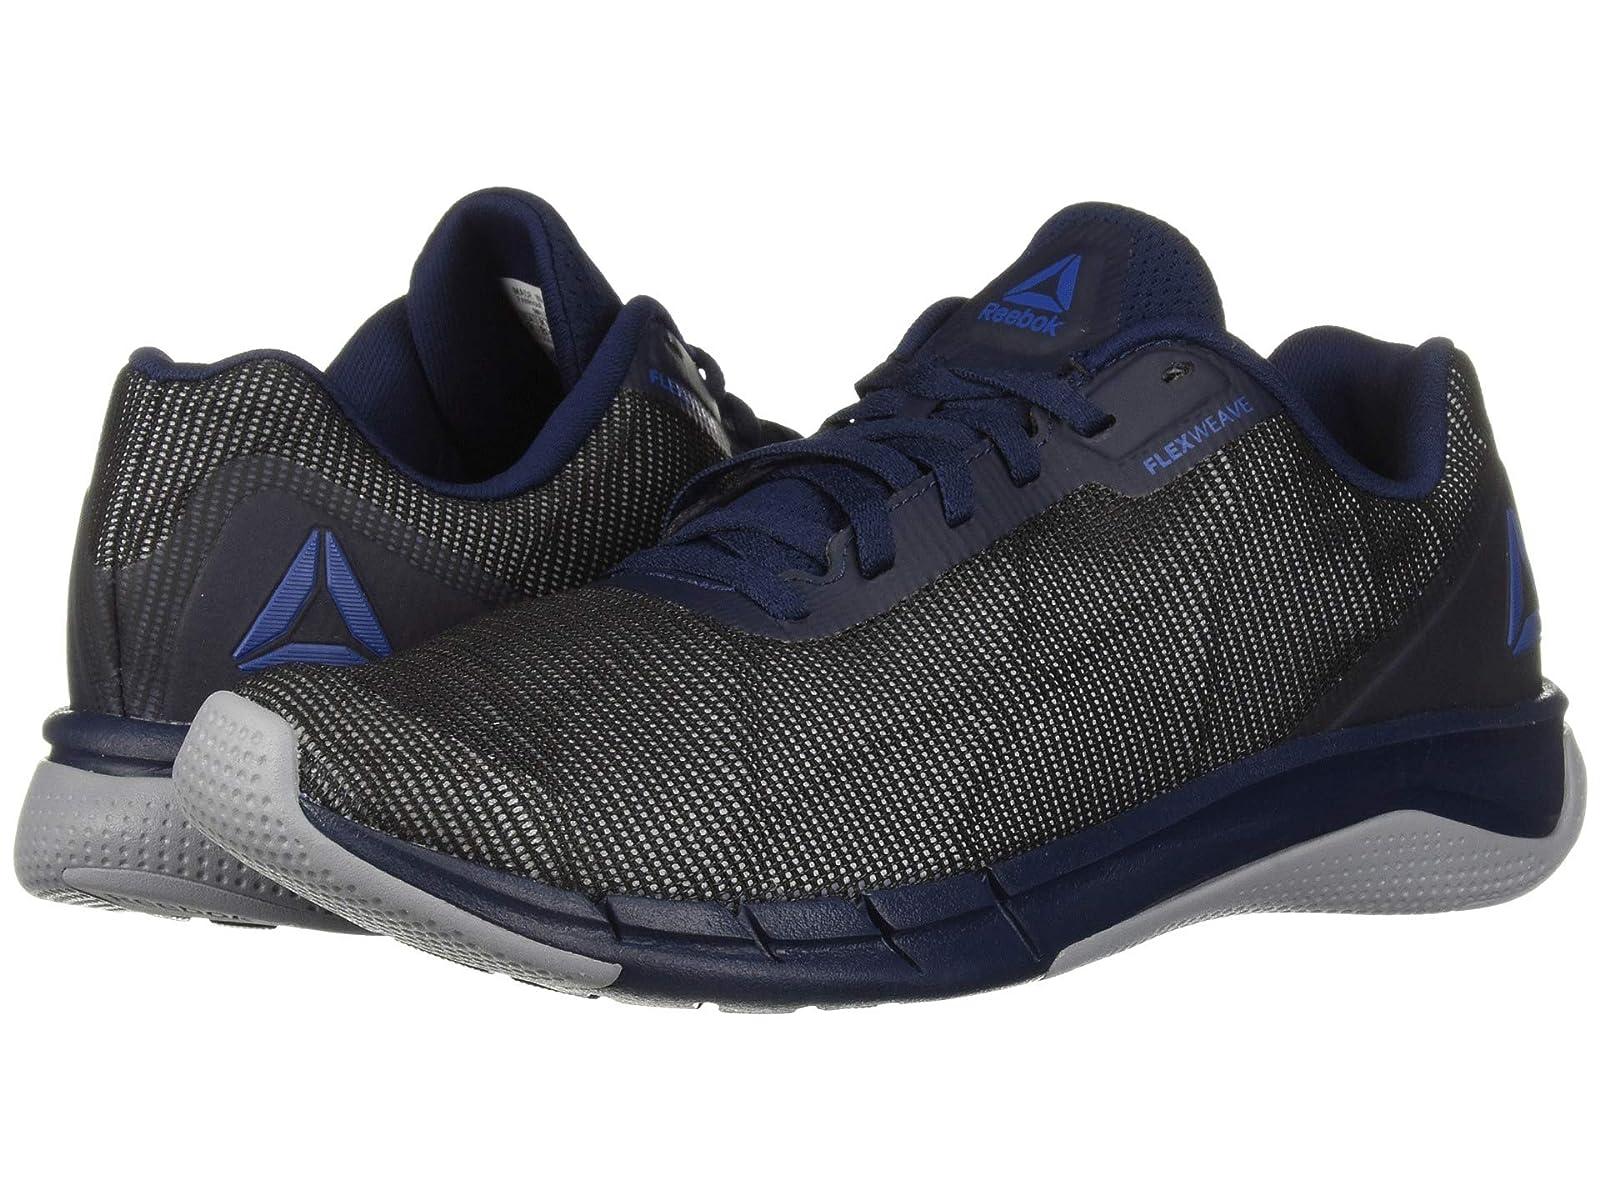 Reebok FSTR FlexweaveAtmospheric grades have affordable shoes